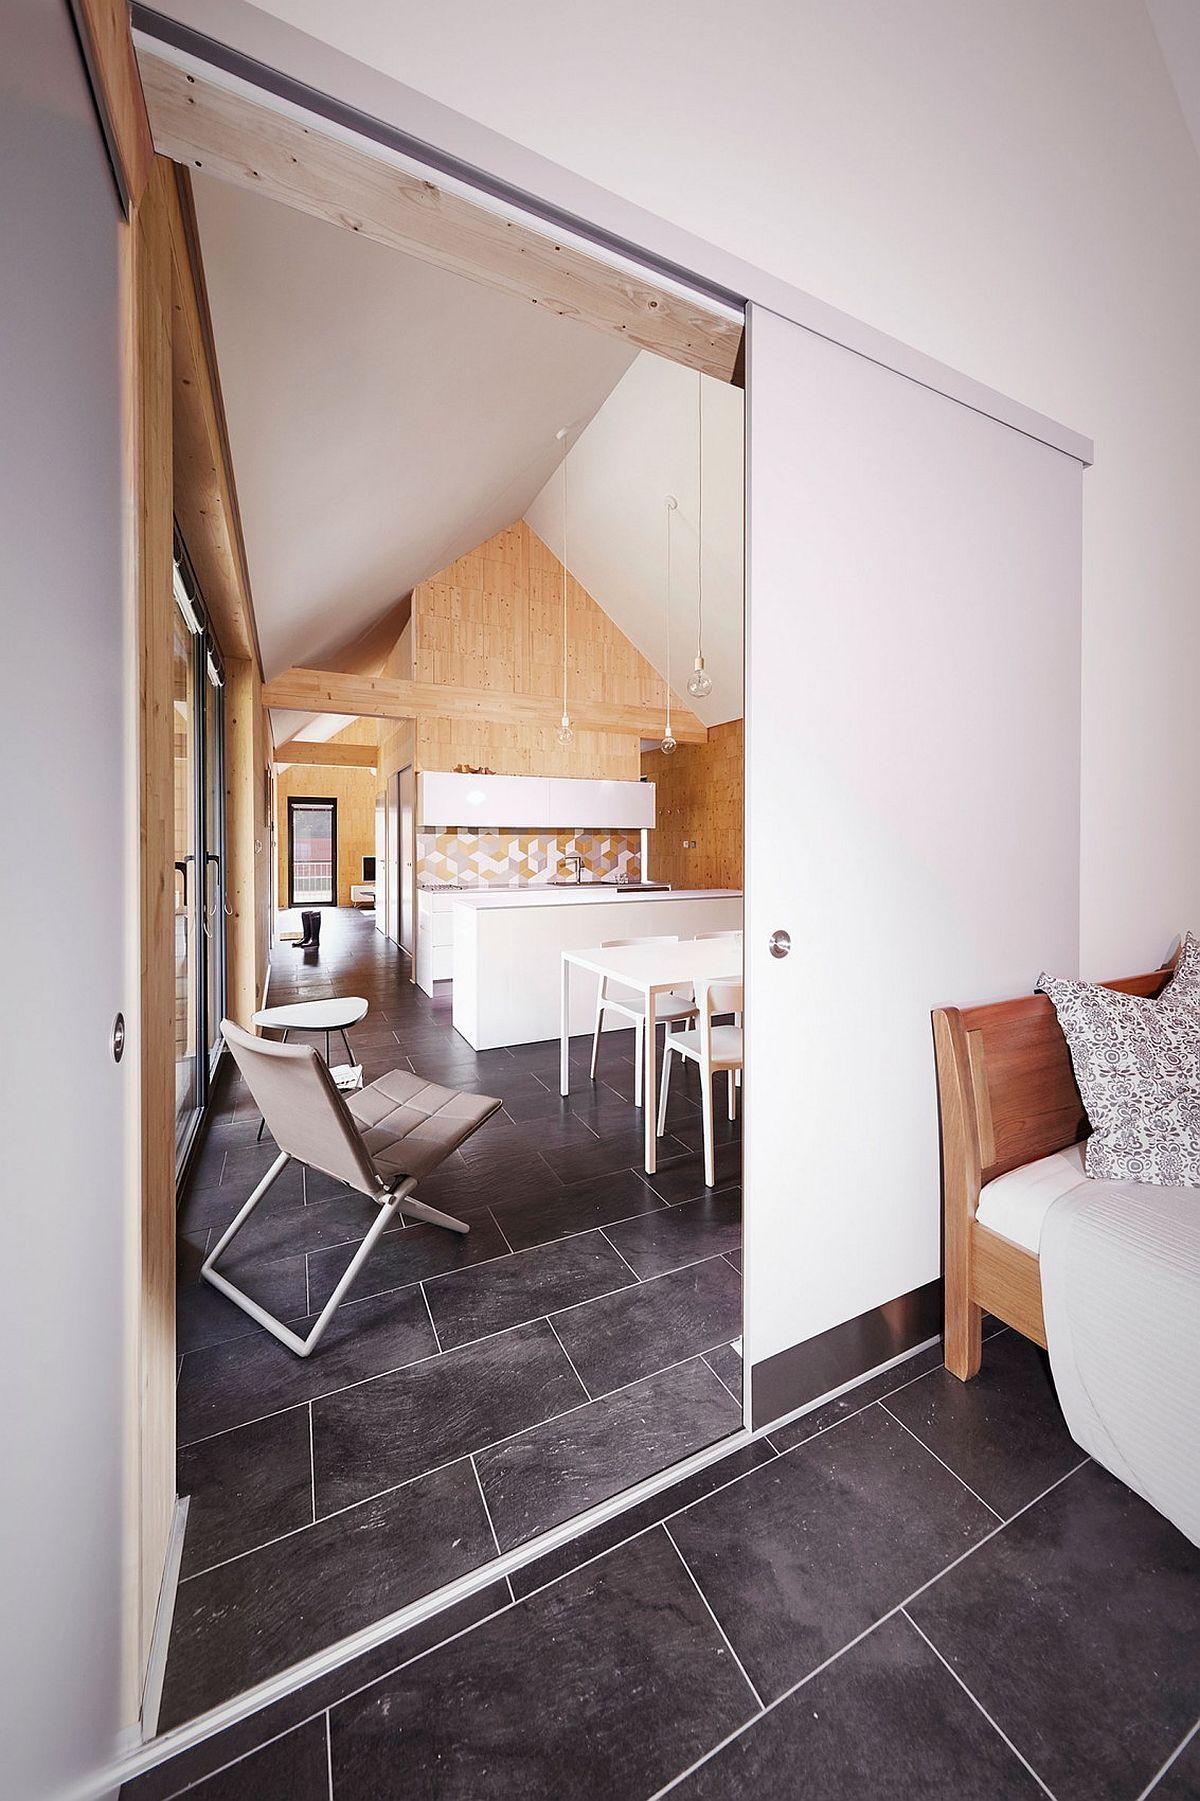 Sliding door separates living room from kitchen